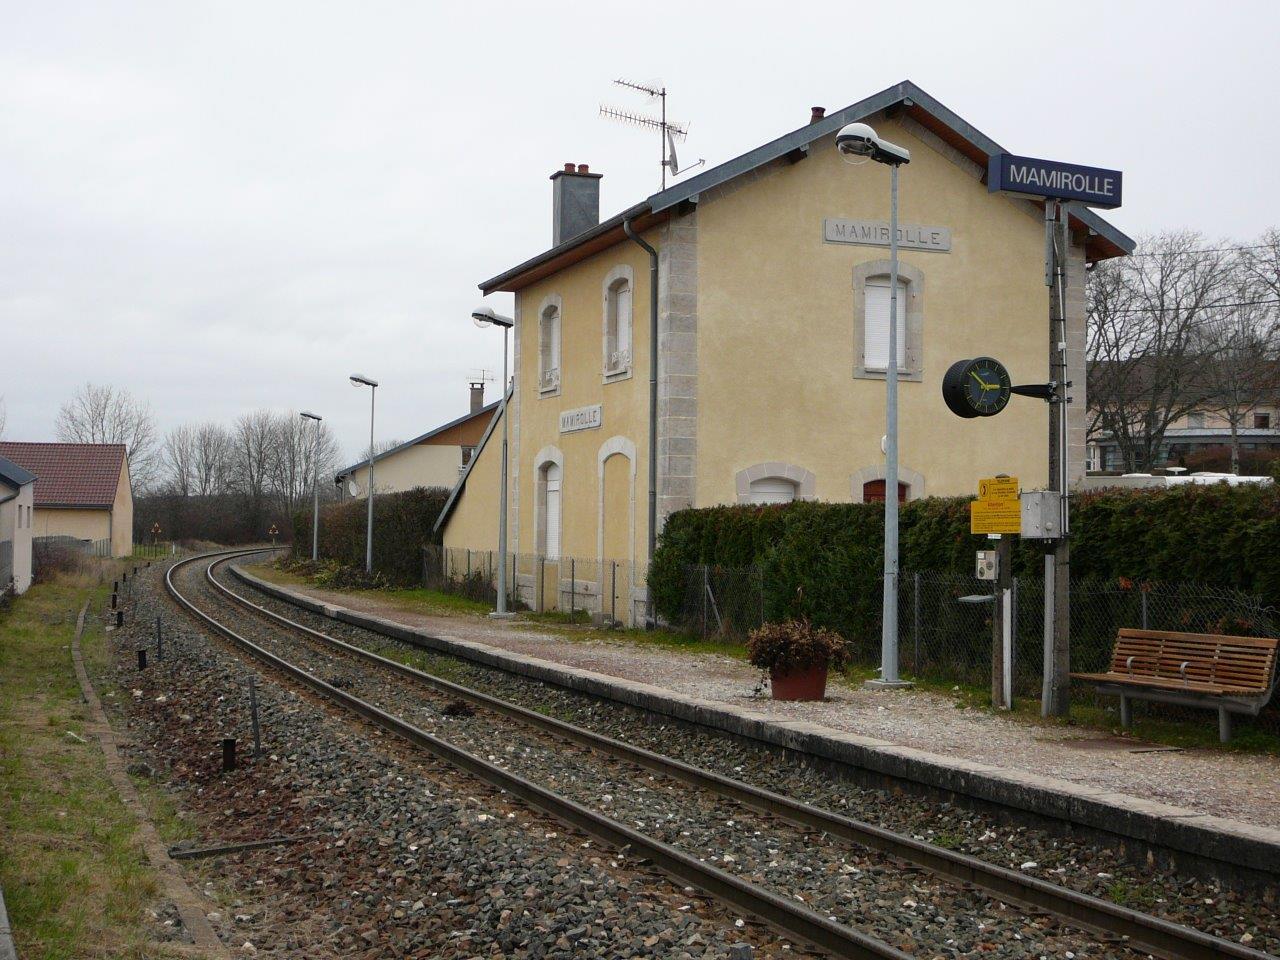 gare-de-mamirolle-train-station